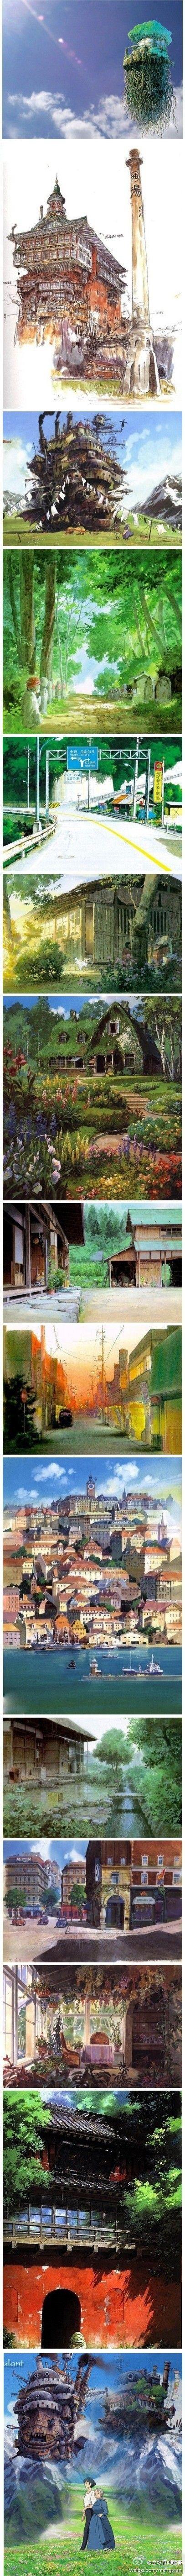 Background layout art in Hayao Miyazaki films.